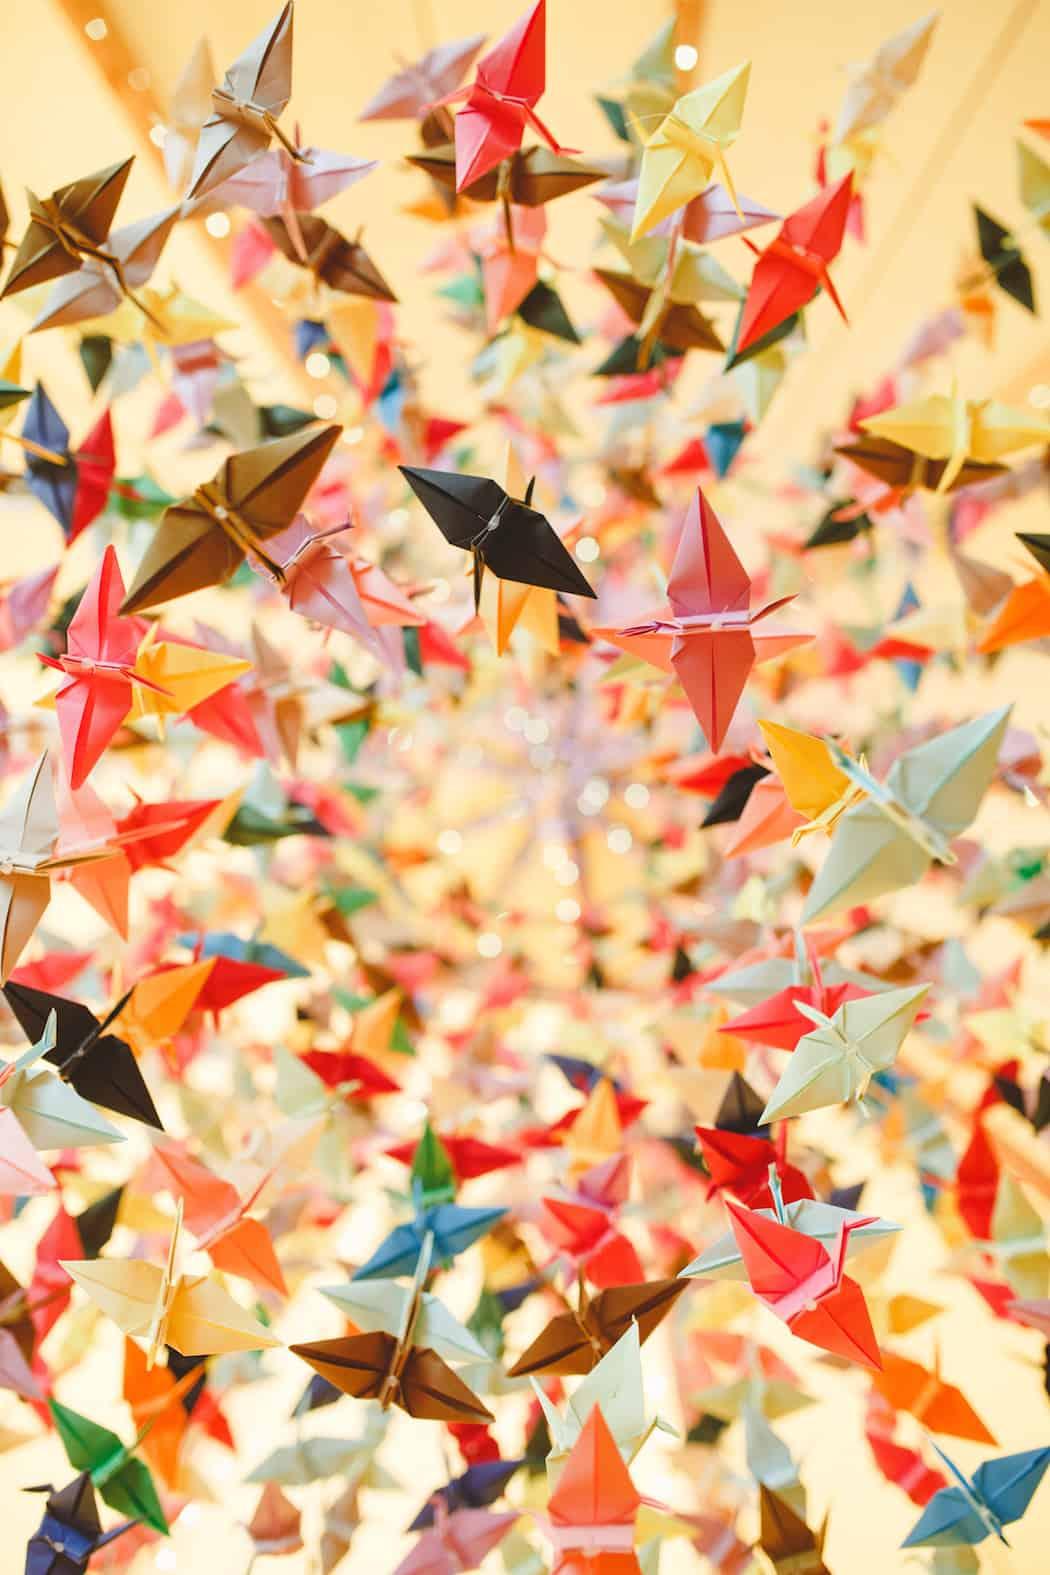 1000 DIY Origami paper cranes hanging in tipi